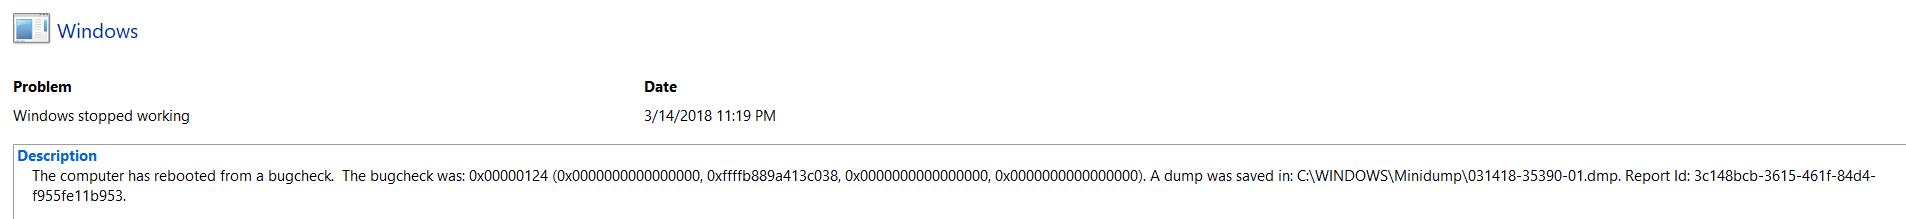 Windows 10 0x124 bugcheck error 0x124_AuthenticAMD_PROCESSOR_BUS_PRV